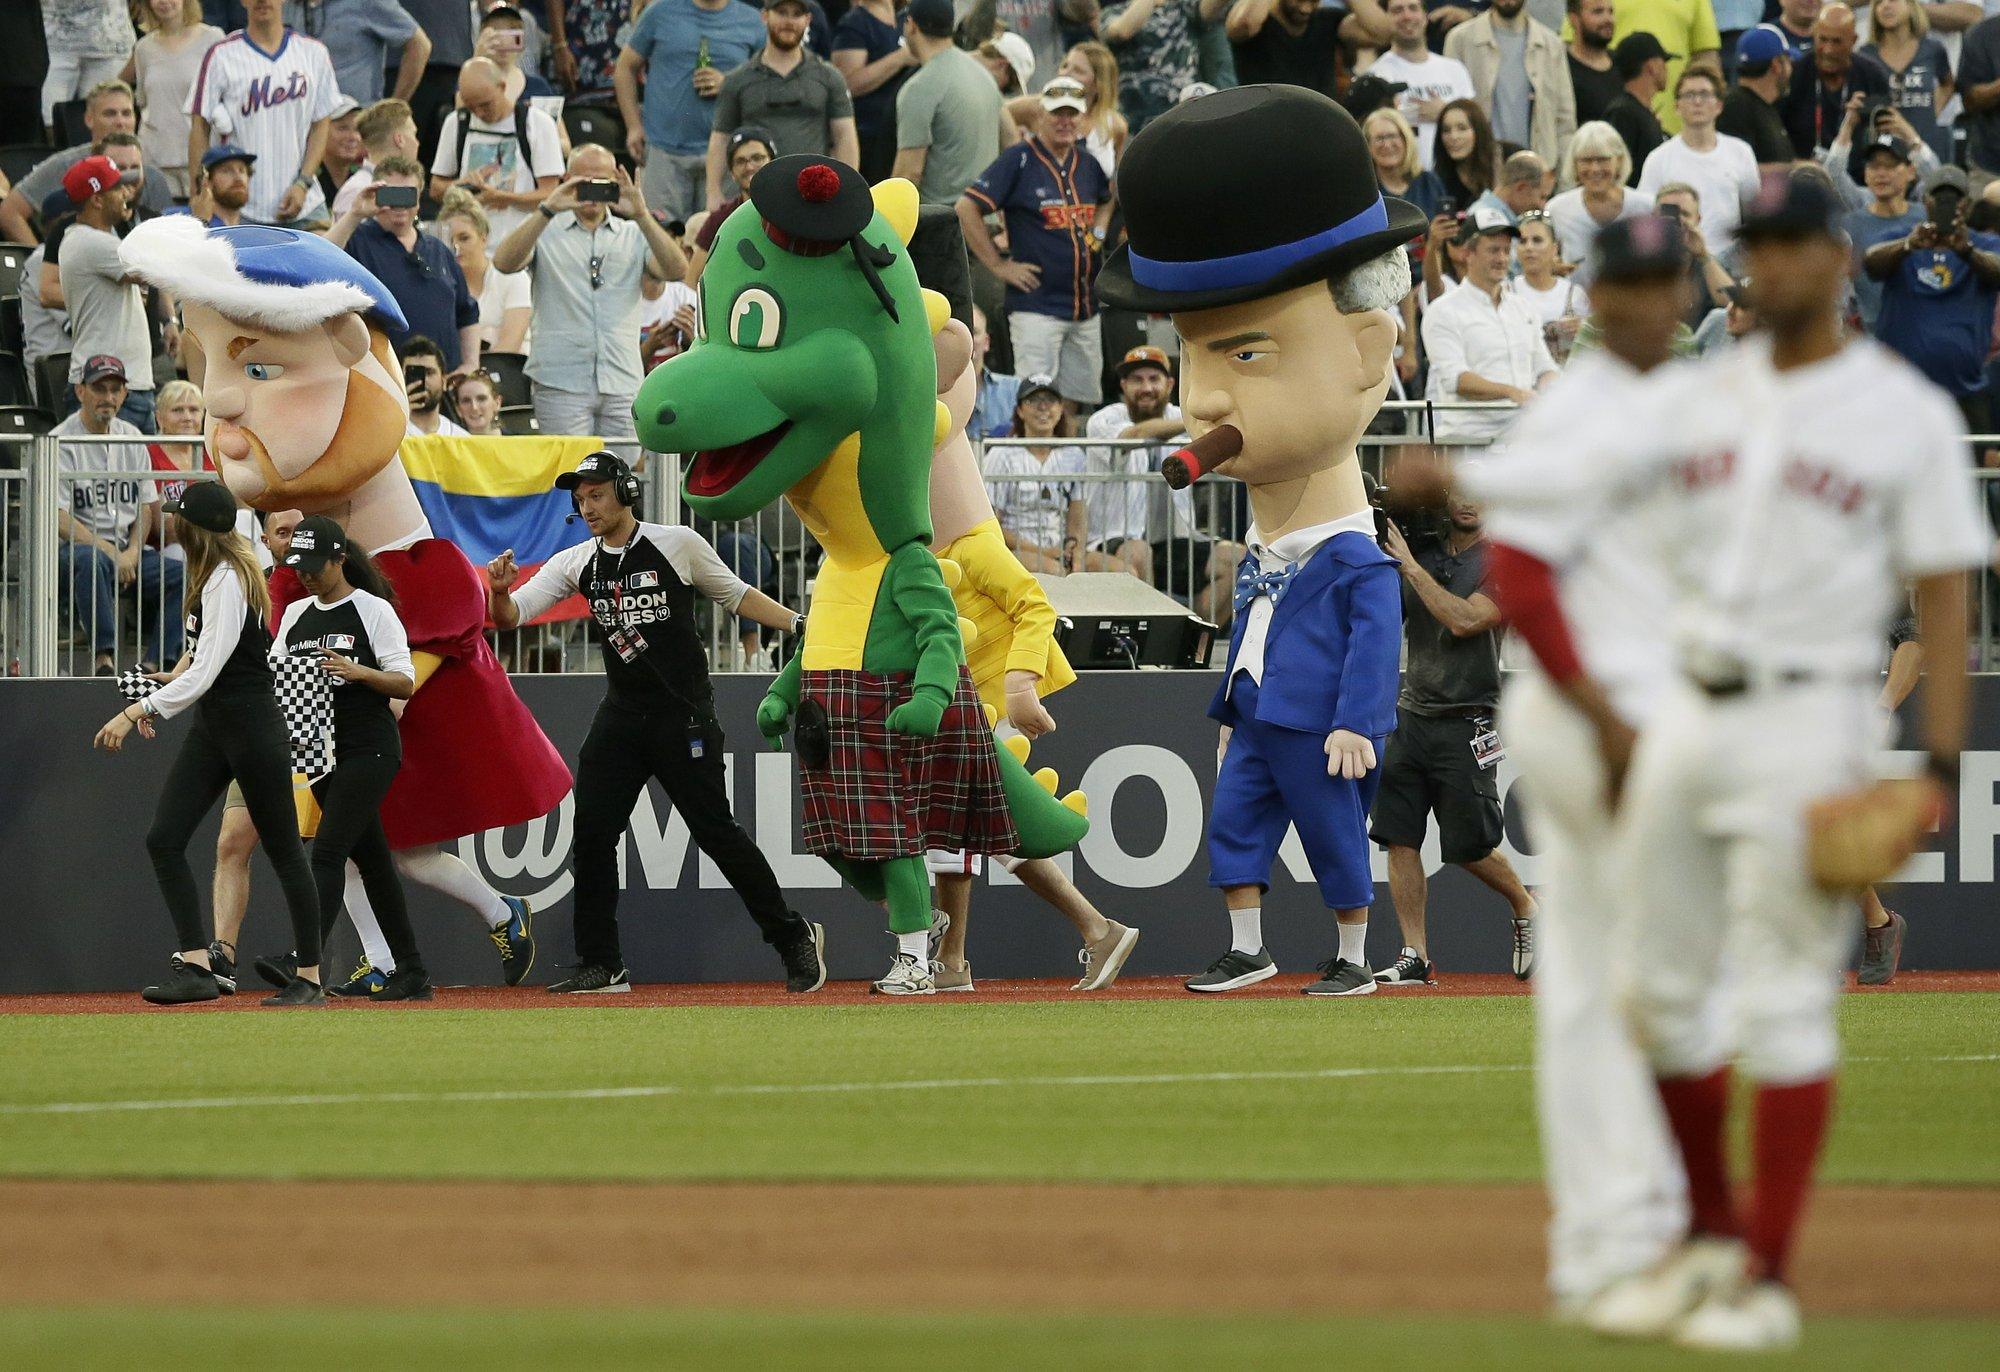 'American positivity': Baseball popular with British fans